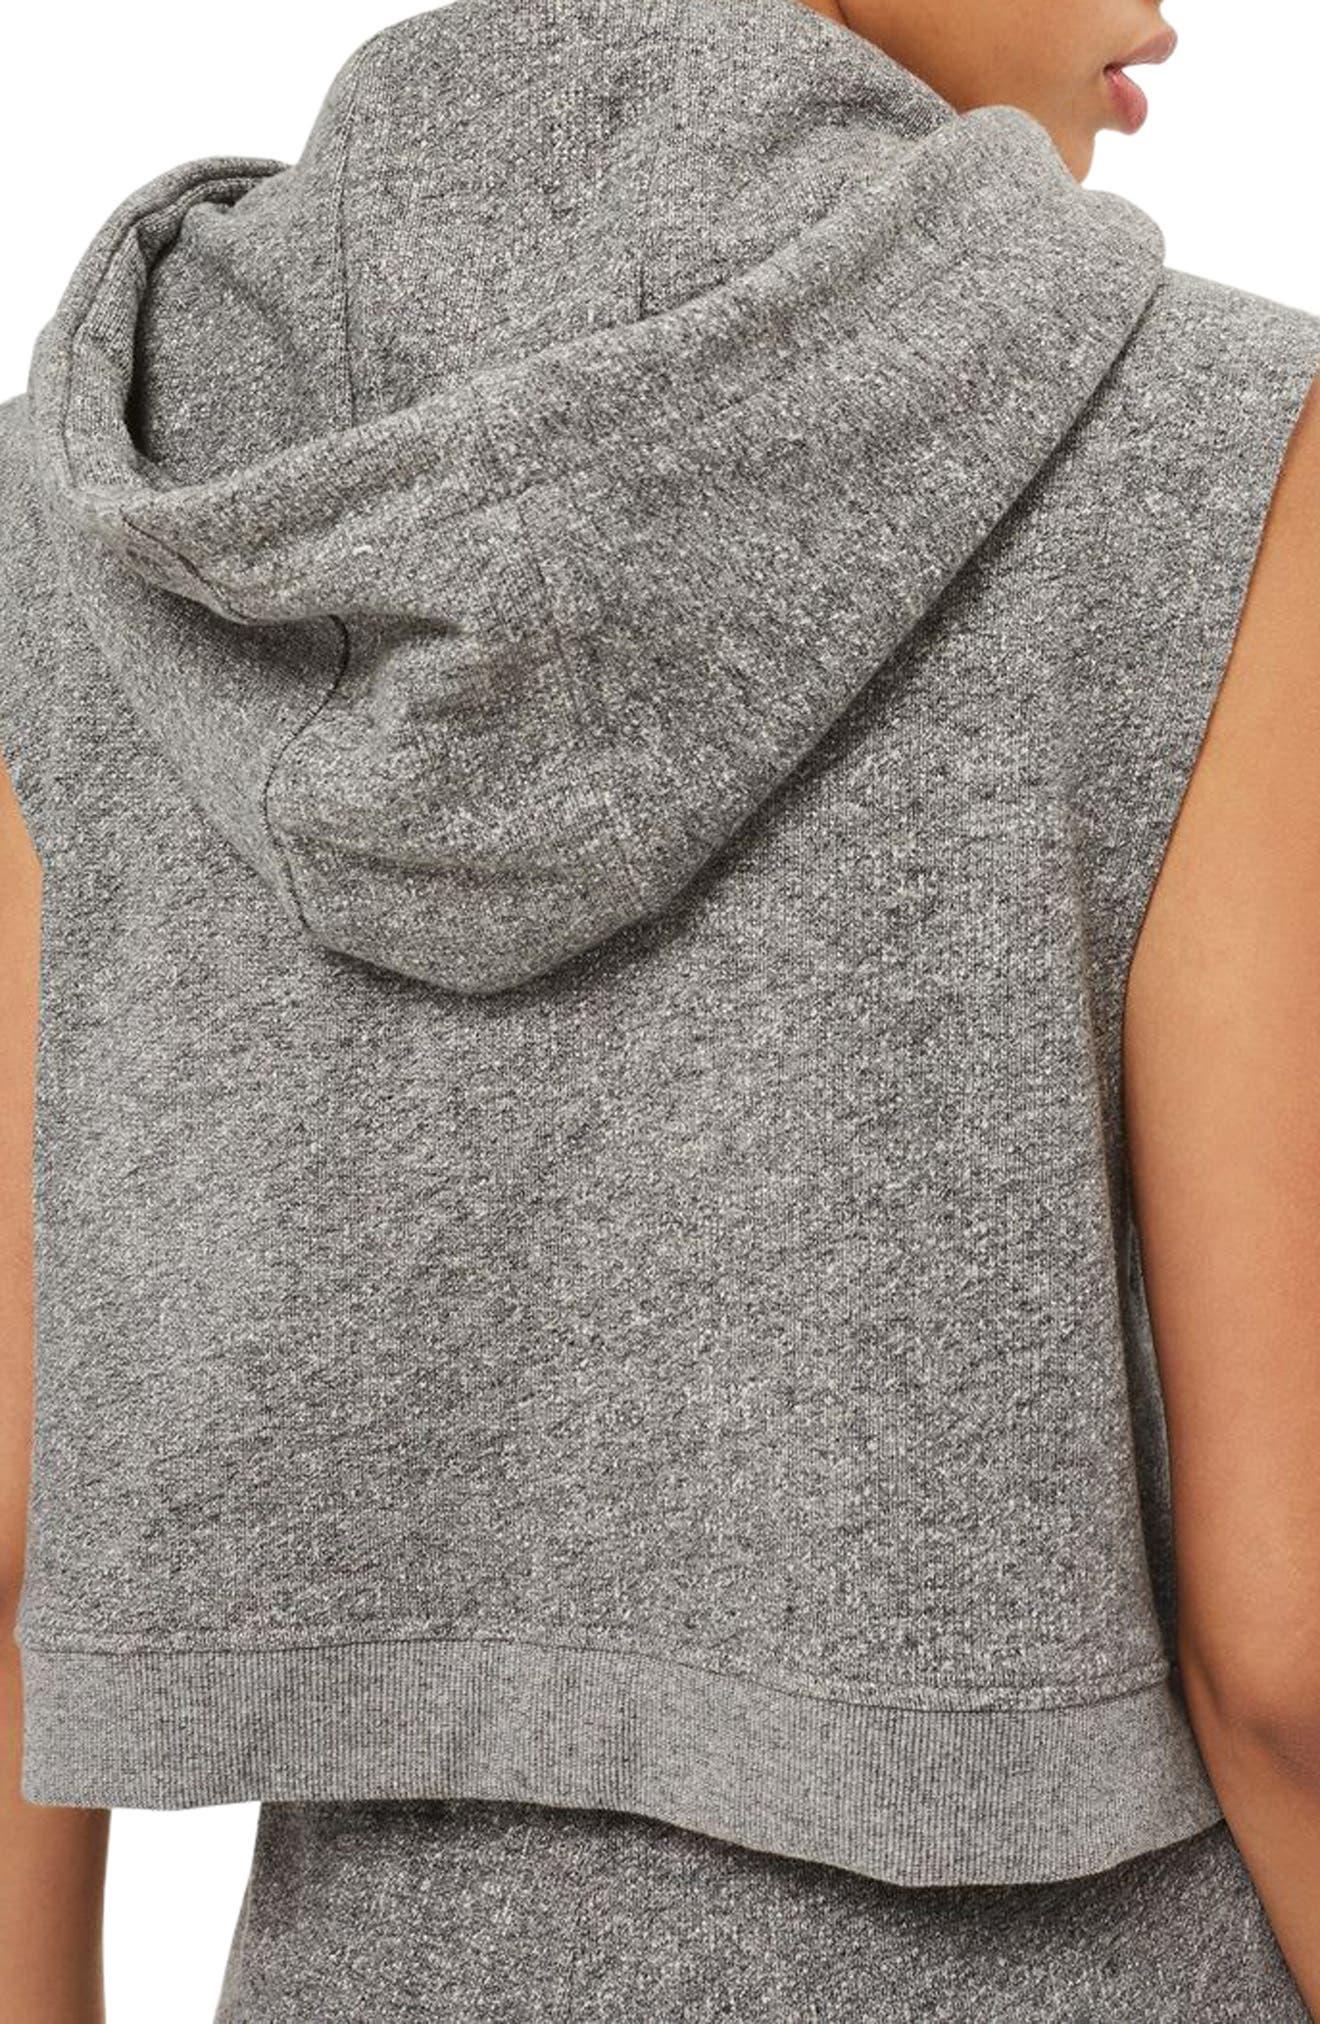 Alternate Image 3  - IVY PARK® Chenille Logo Sleeveless Crop Hoodie